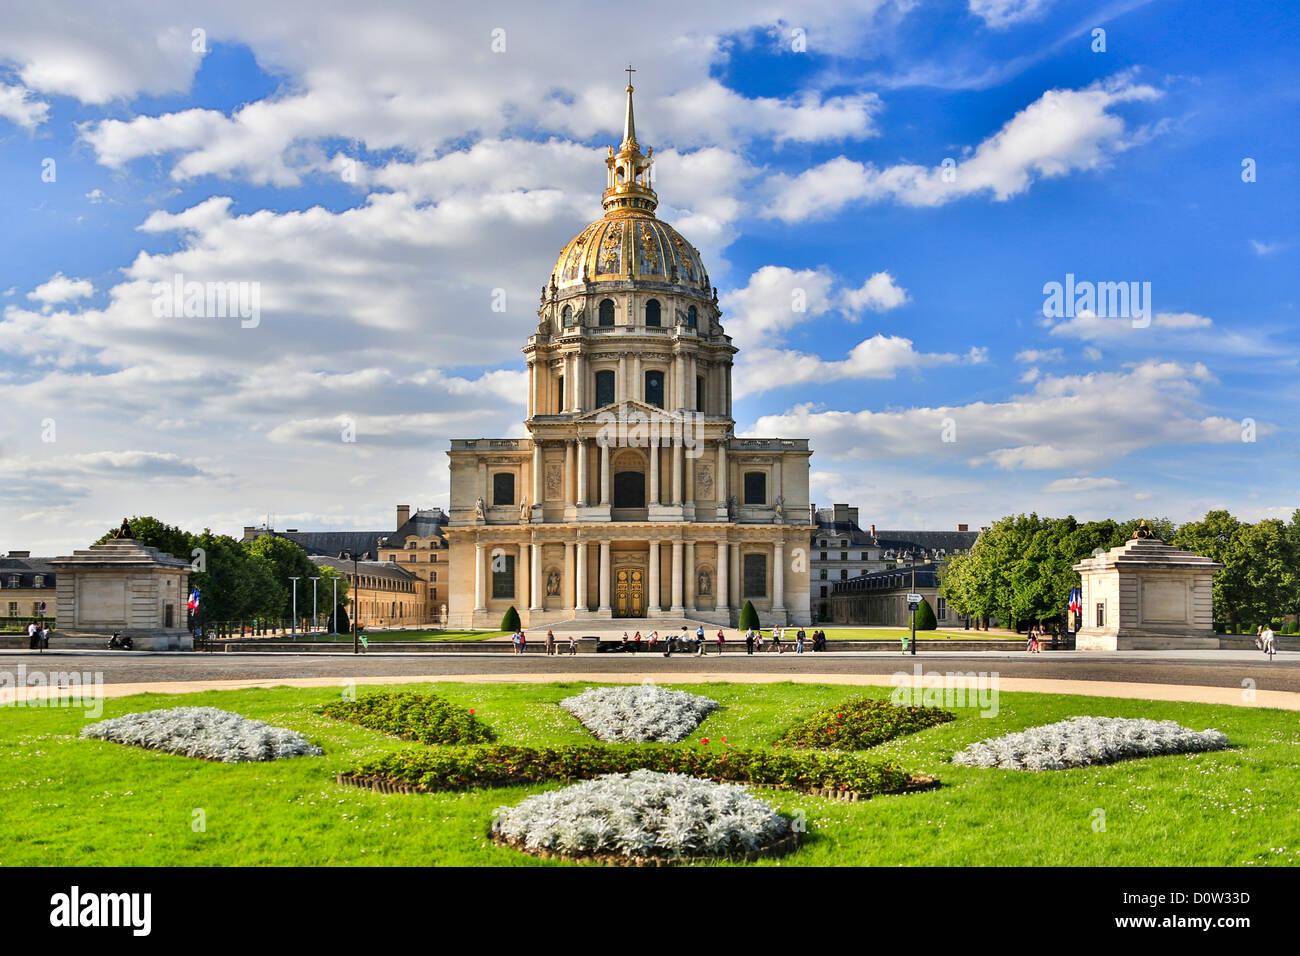 France Europe travel Paris City Les Invalides Napoleon grave architecture building dome history invalides memorial - Stock Image